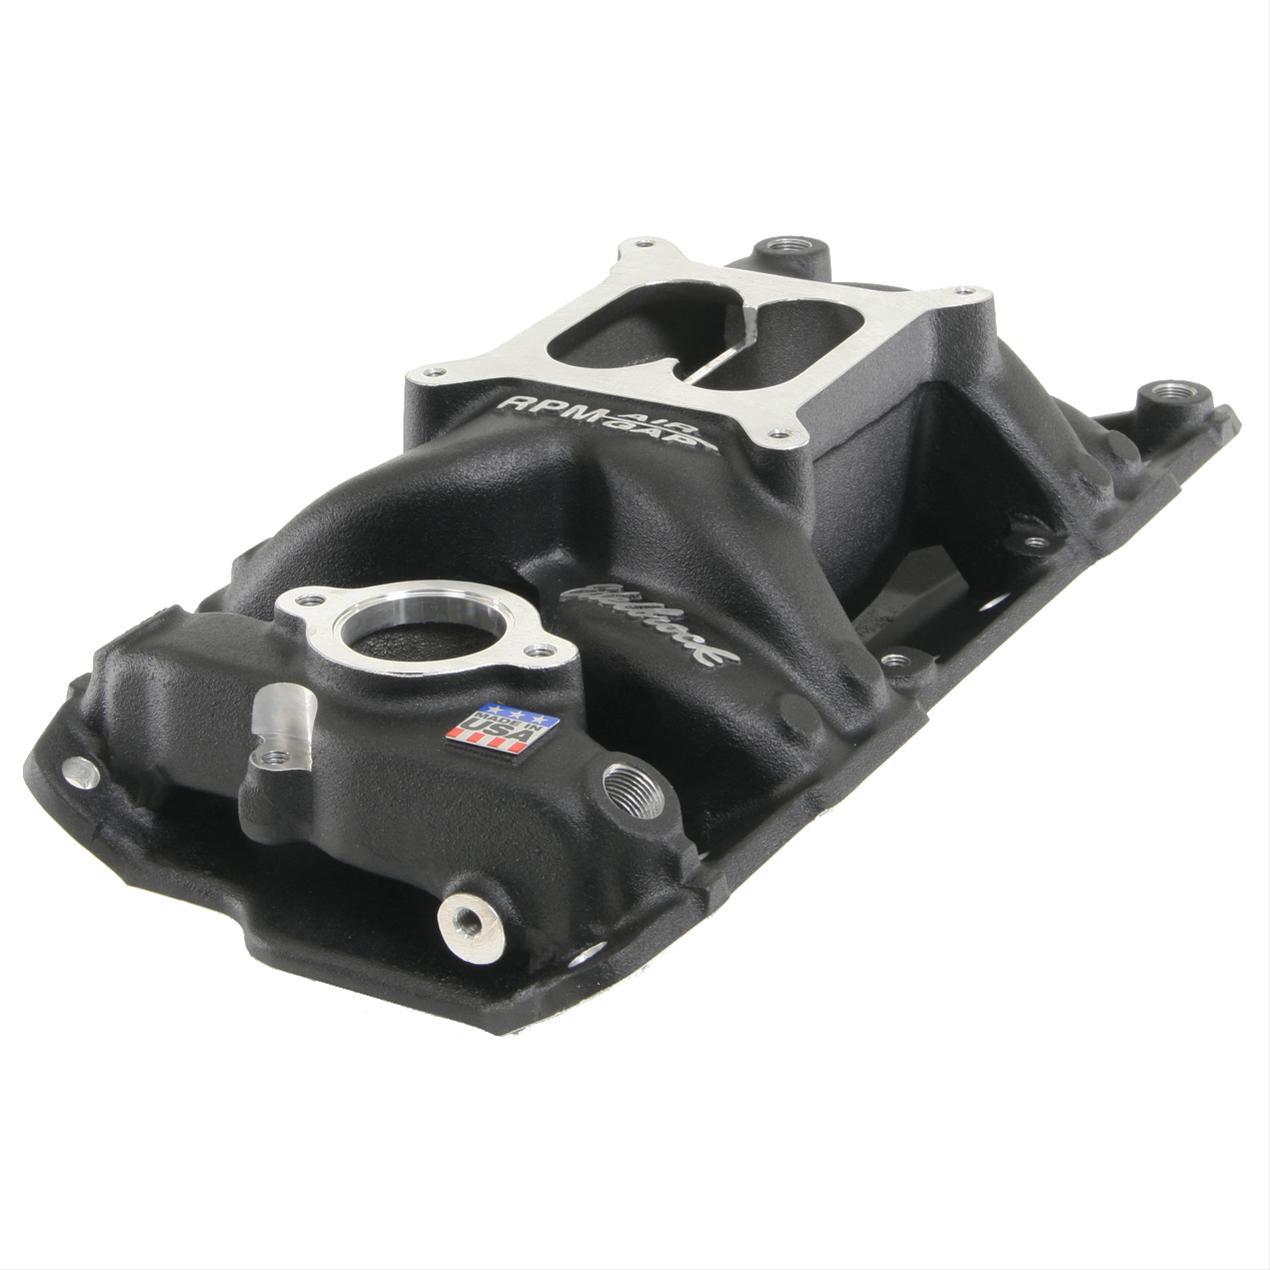 Edelbrock Performer RPM Air-Gap Intake Manifold 75013 Fits